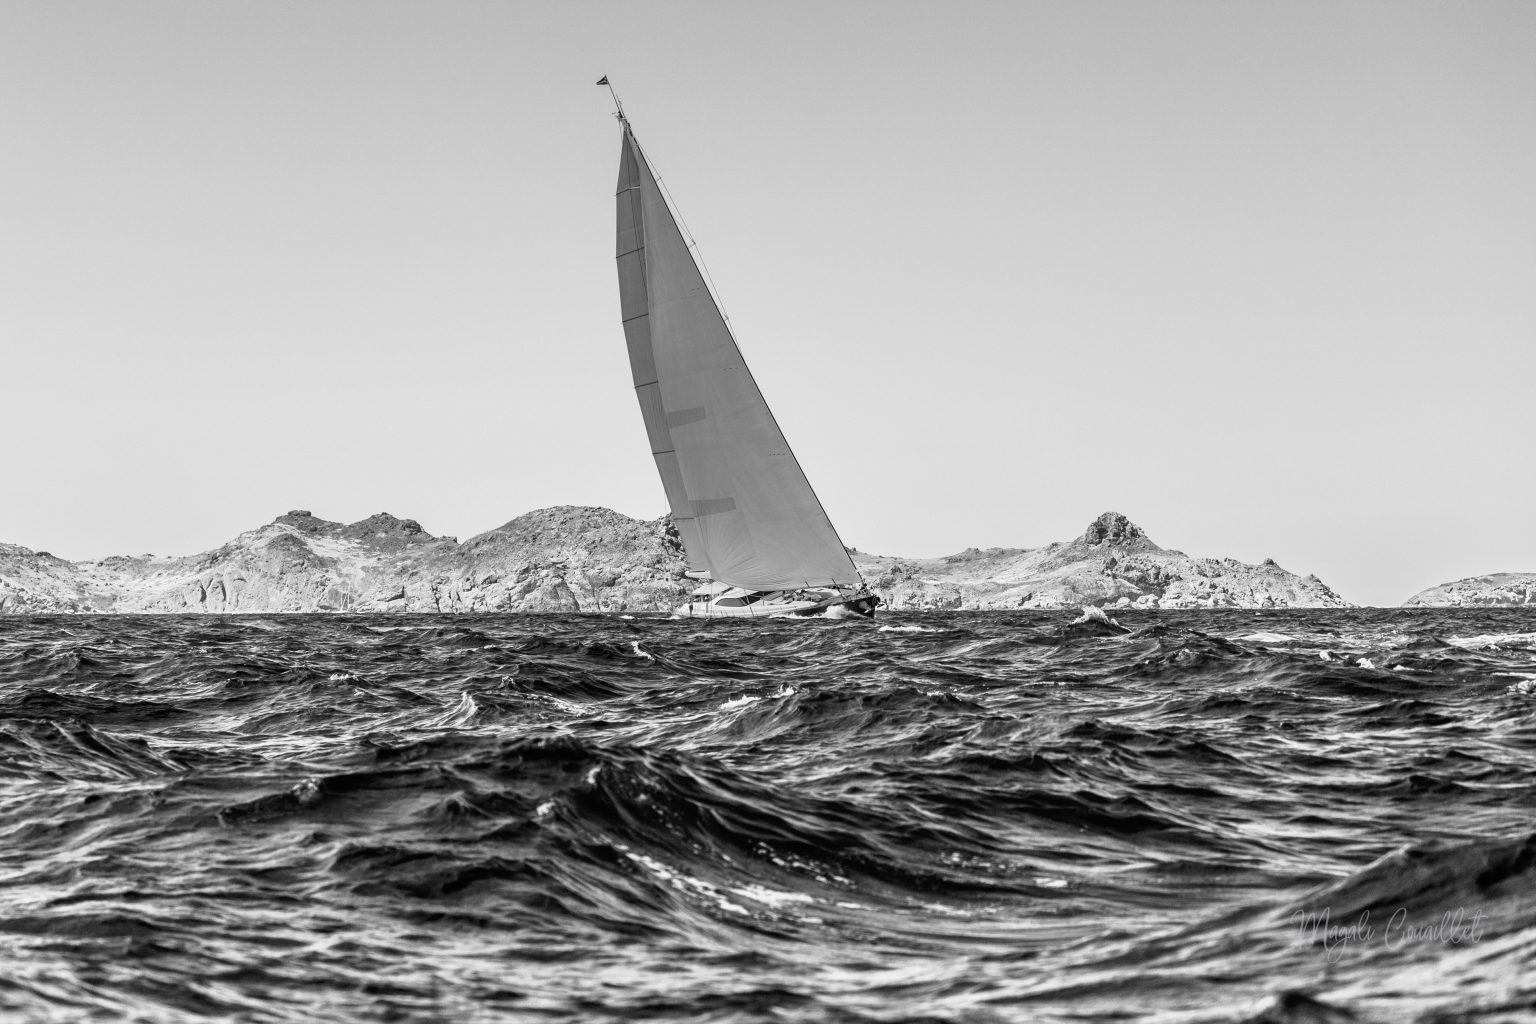 Sail Yacht, Bucket Regatta 2019 St Barths-8